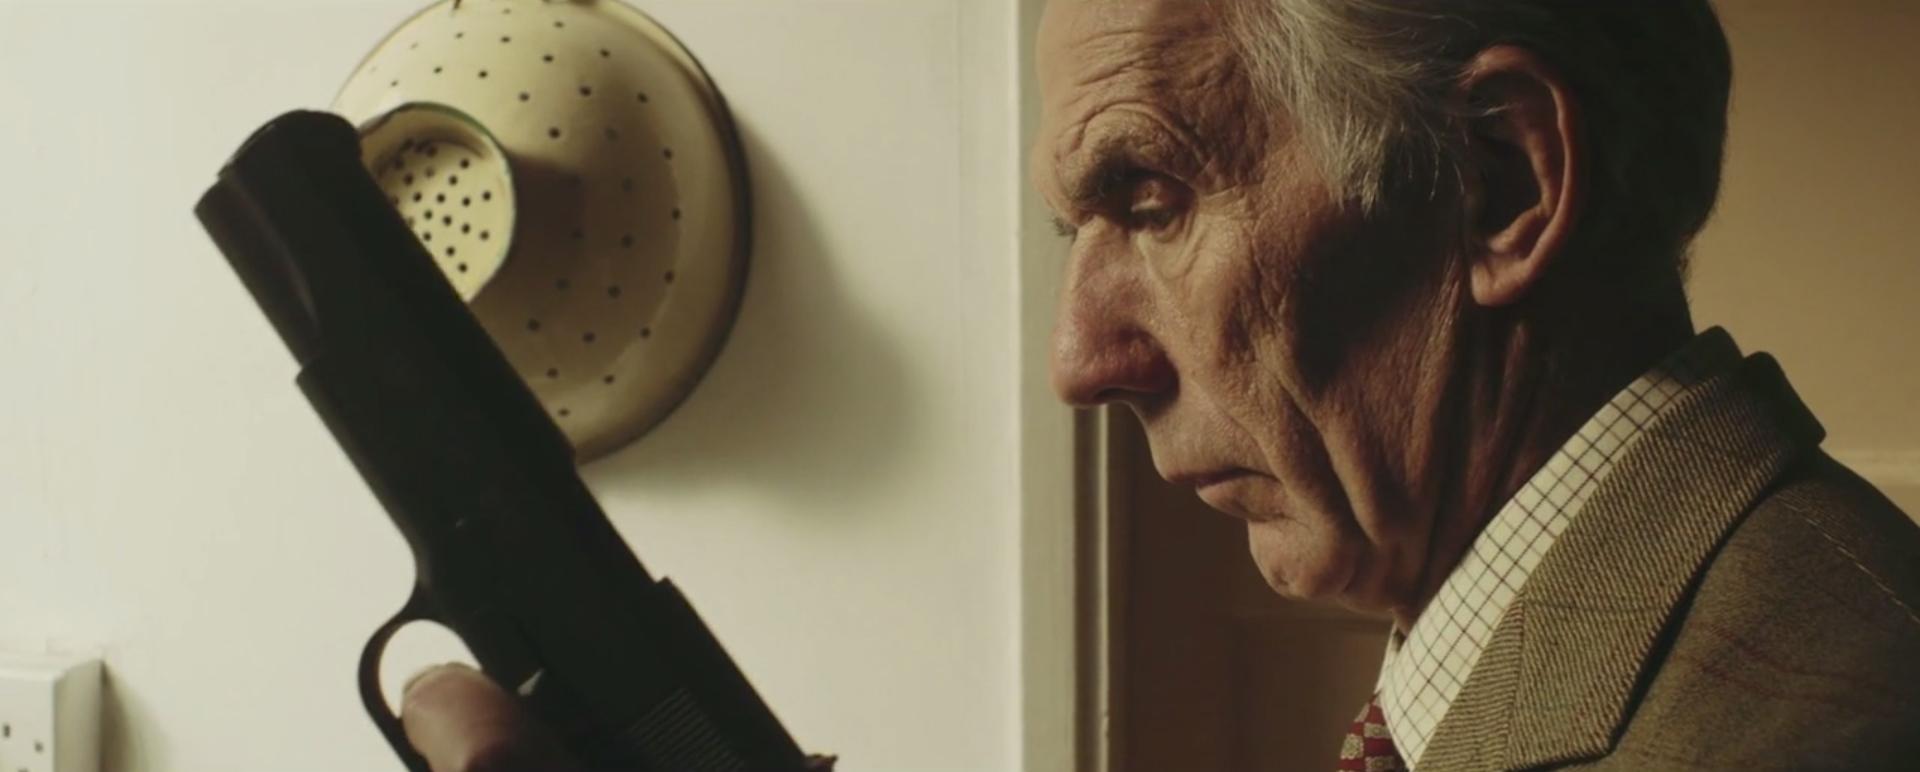 SATAN HAS A BUSHY TAIL  Short Film - Satan Has A Bushy Tail is a wickedly fun, charming buddy comedy about grandparents, bereavement & a demonic squirrel. Starring Richard Durden & Tom Bennett.